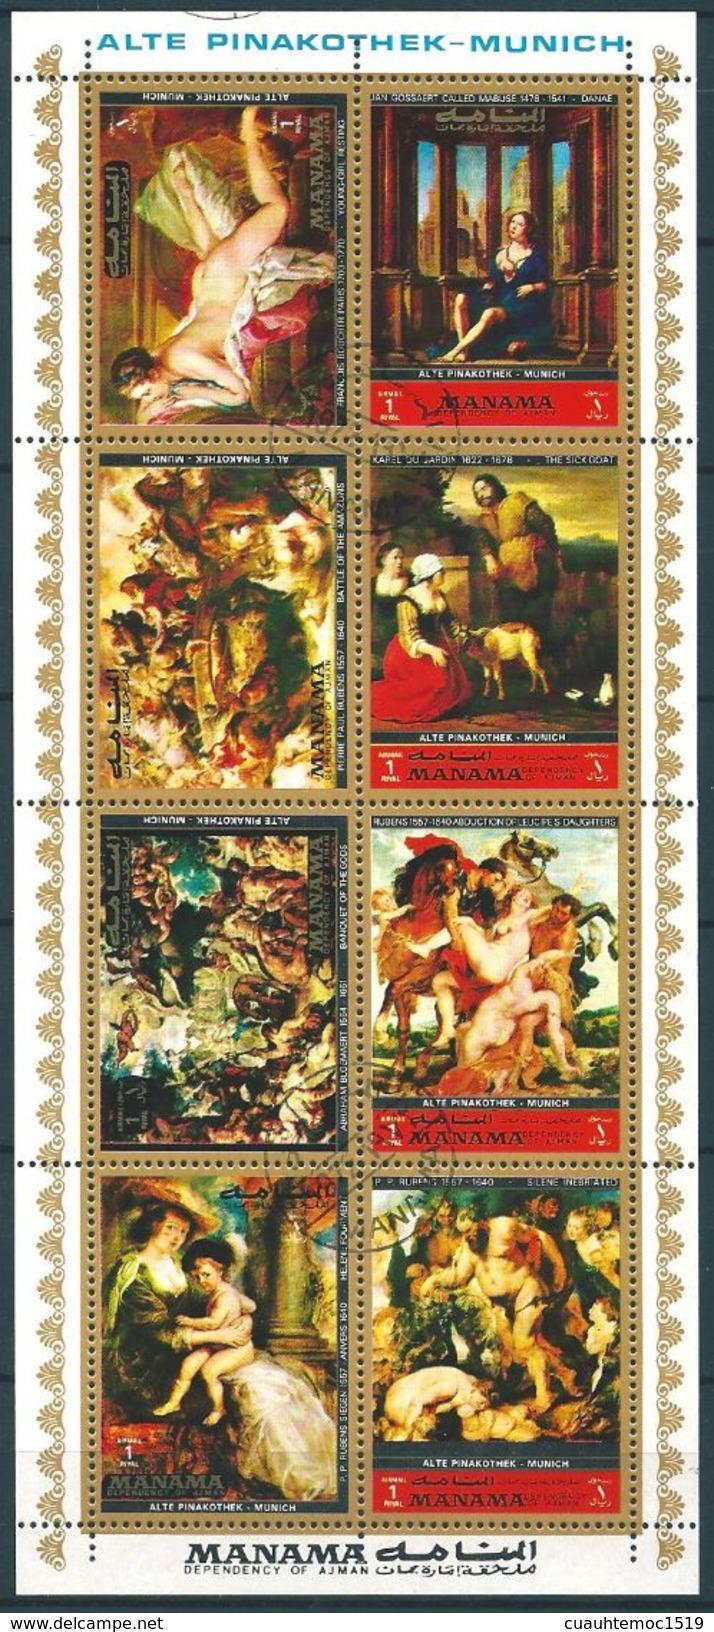 Manama (V.A.E.) 1973: Nr. 1248A-1255A° Gemälde Alte Pinakothek, München #E1 - Manama